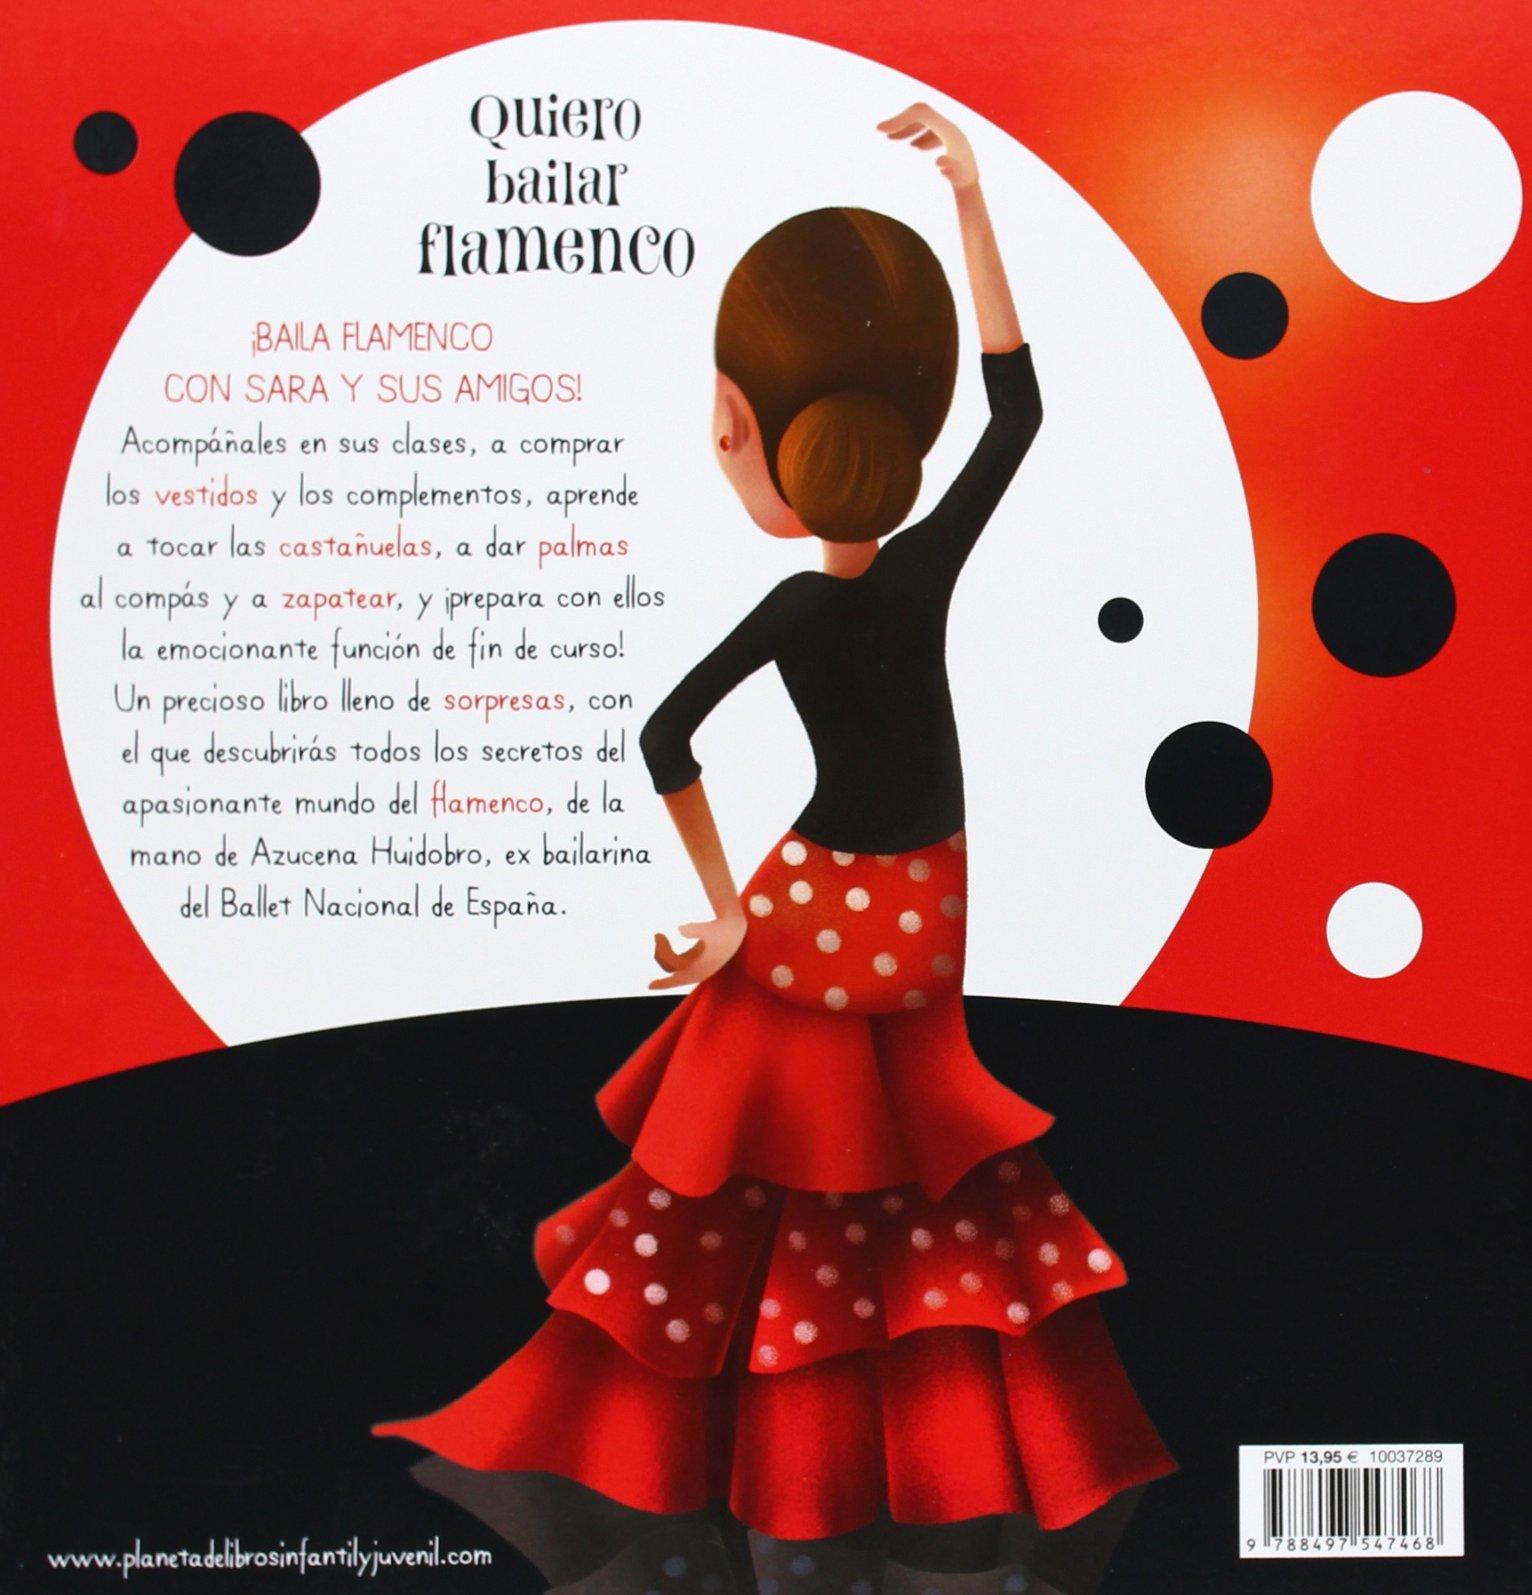 Quiero Bailar Flamenco Libros Prácticos Spanish Edition Huidobro Azucena 9788497547468 Books